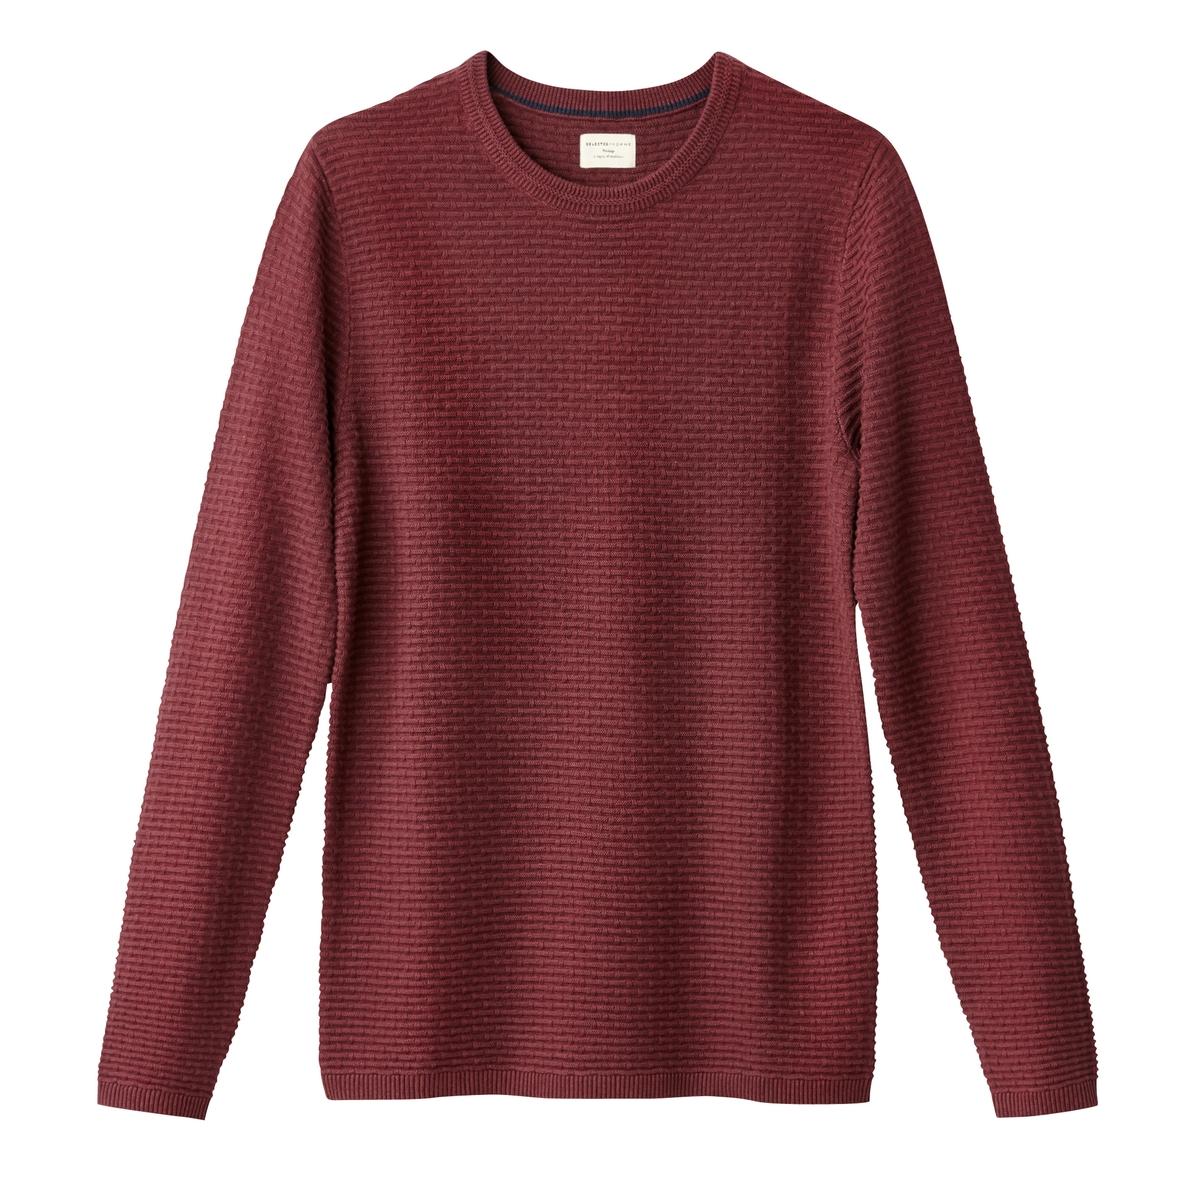 Пуловер из тонкого трикотажа